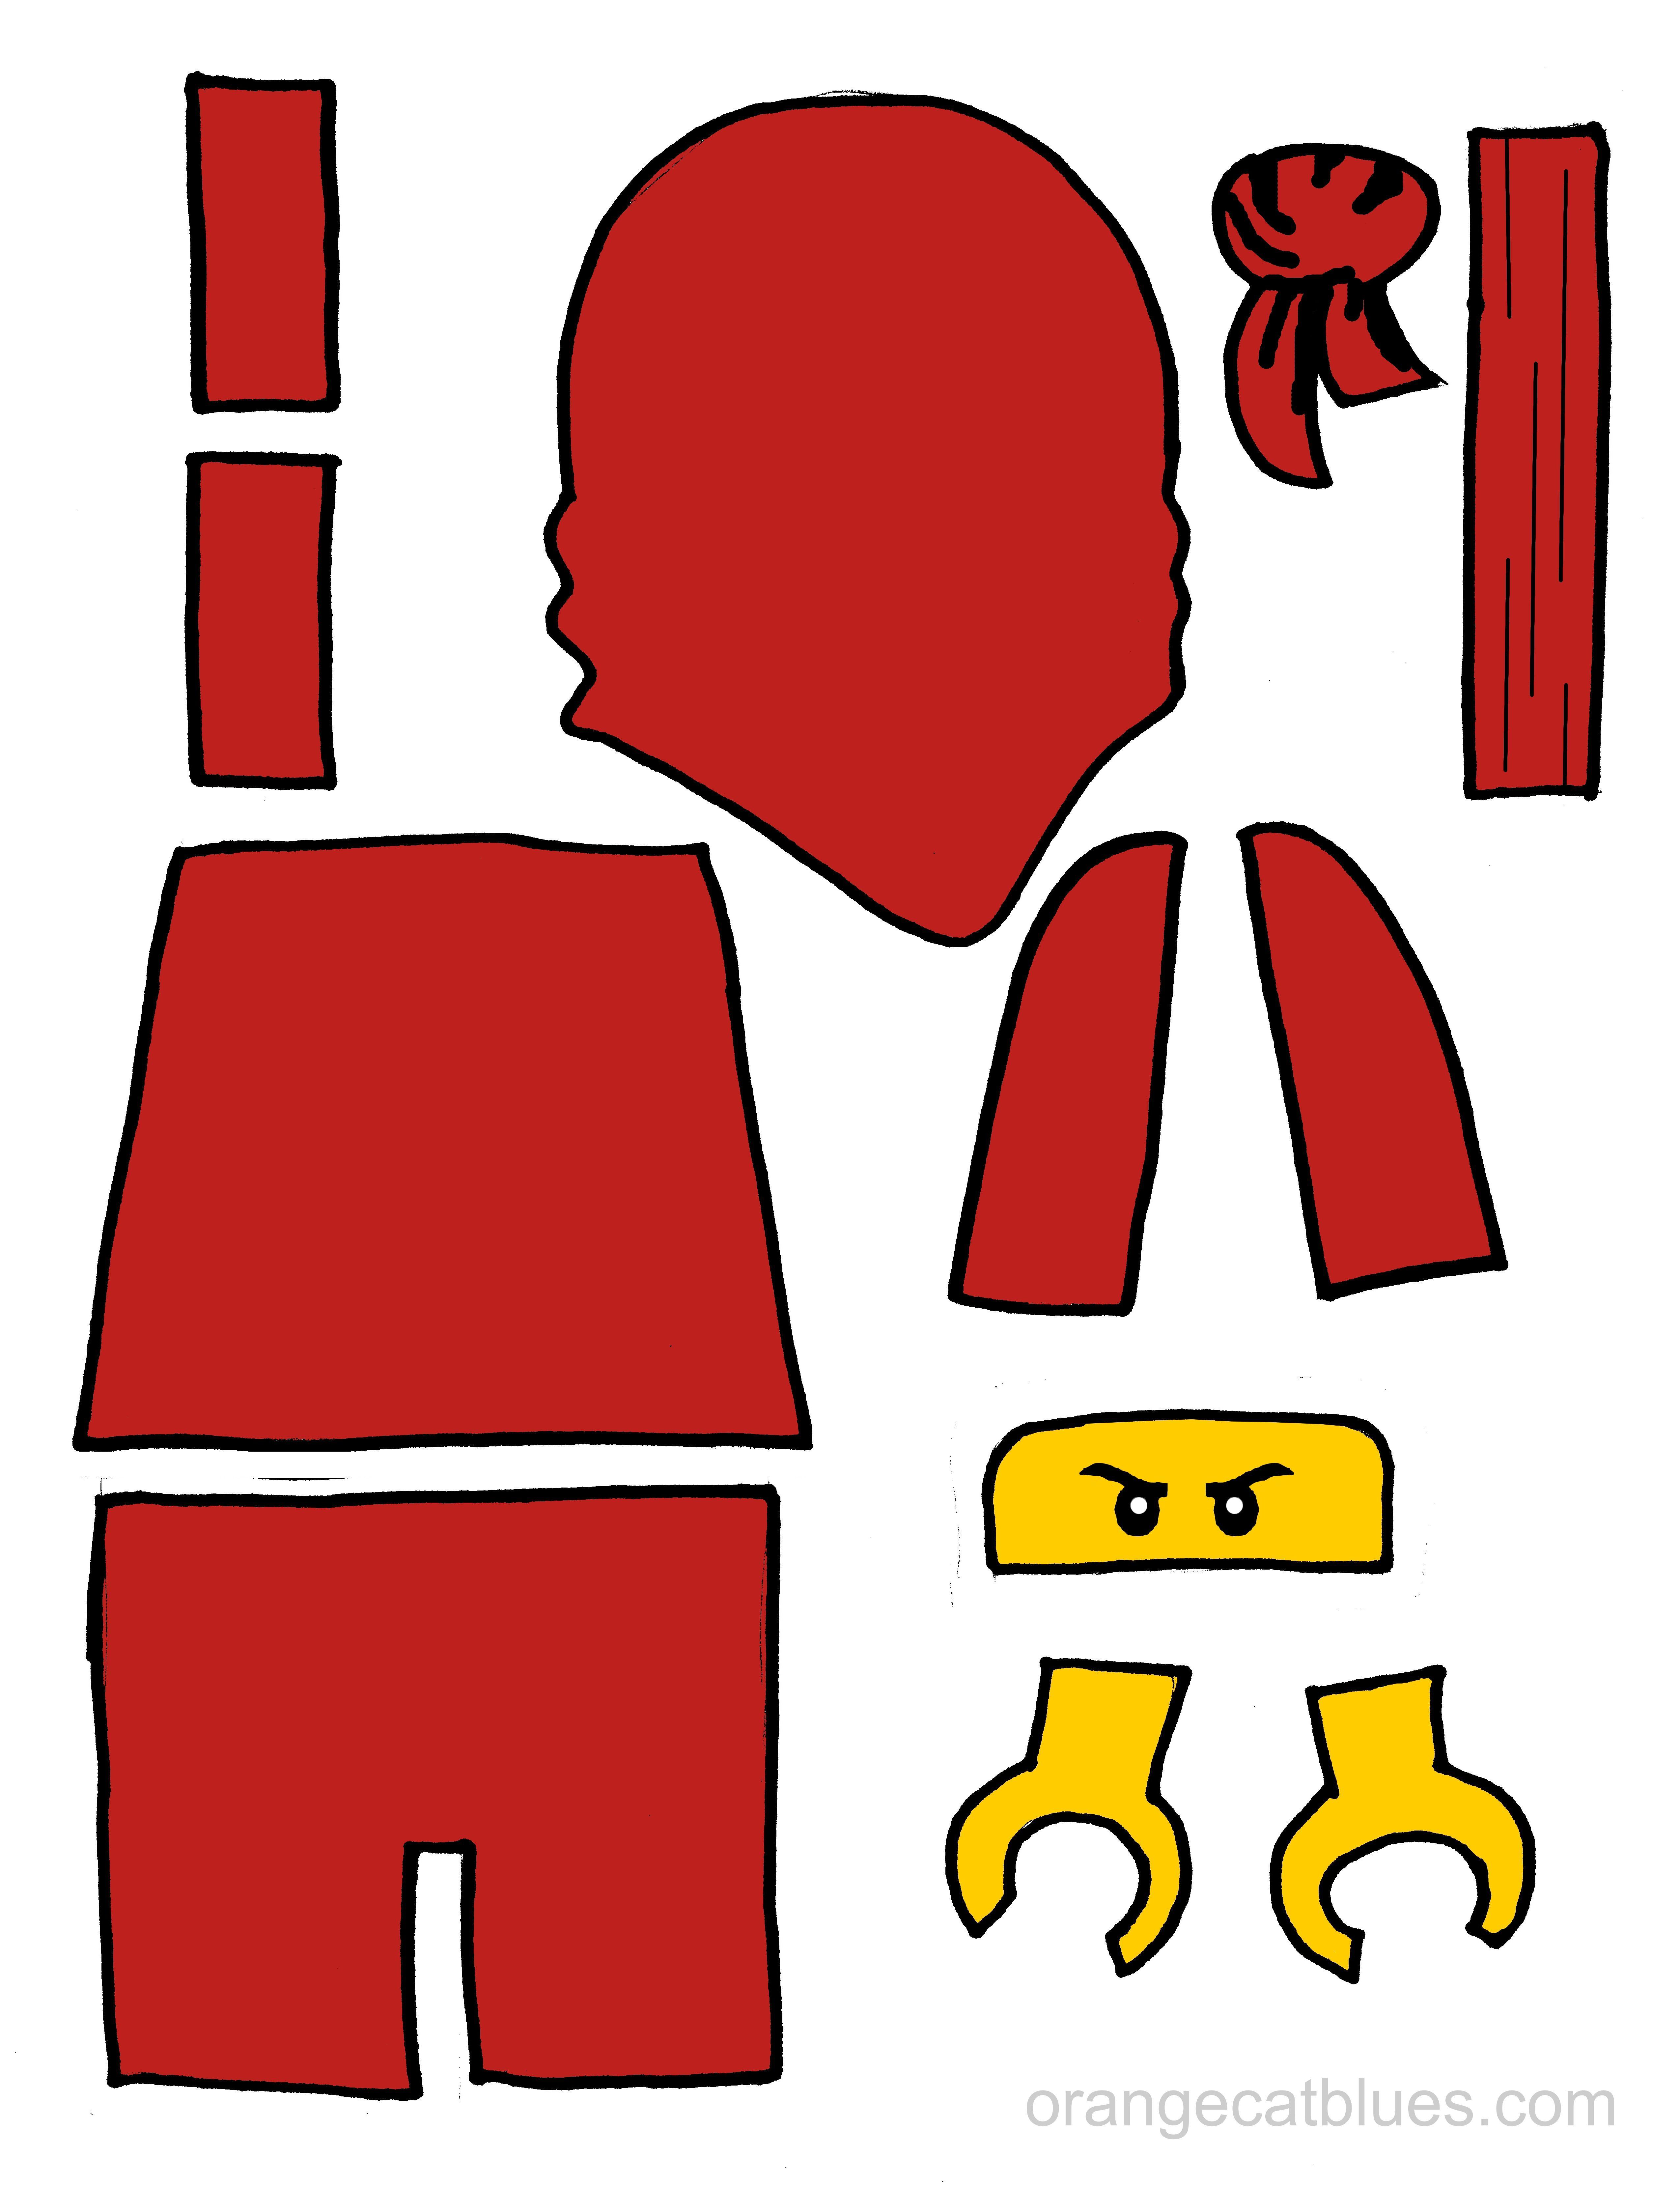 lego ninjago printable cutout for toddler gluestick art the red